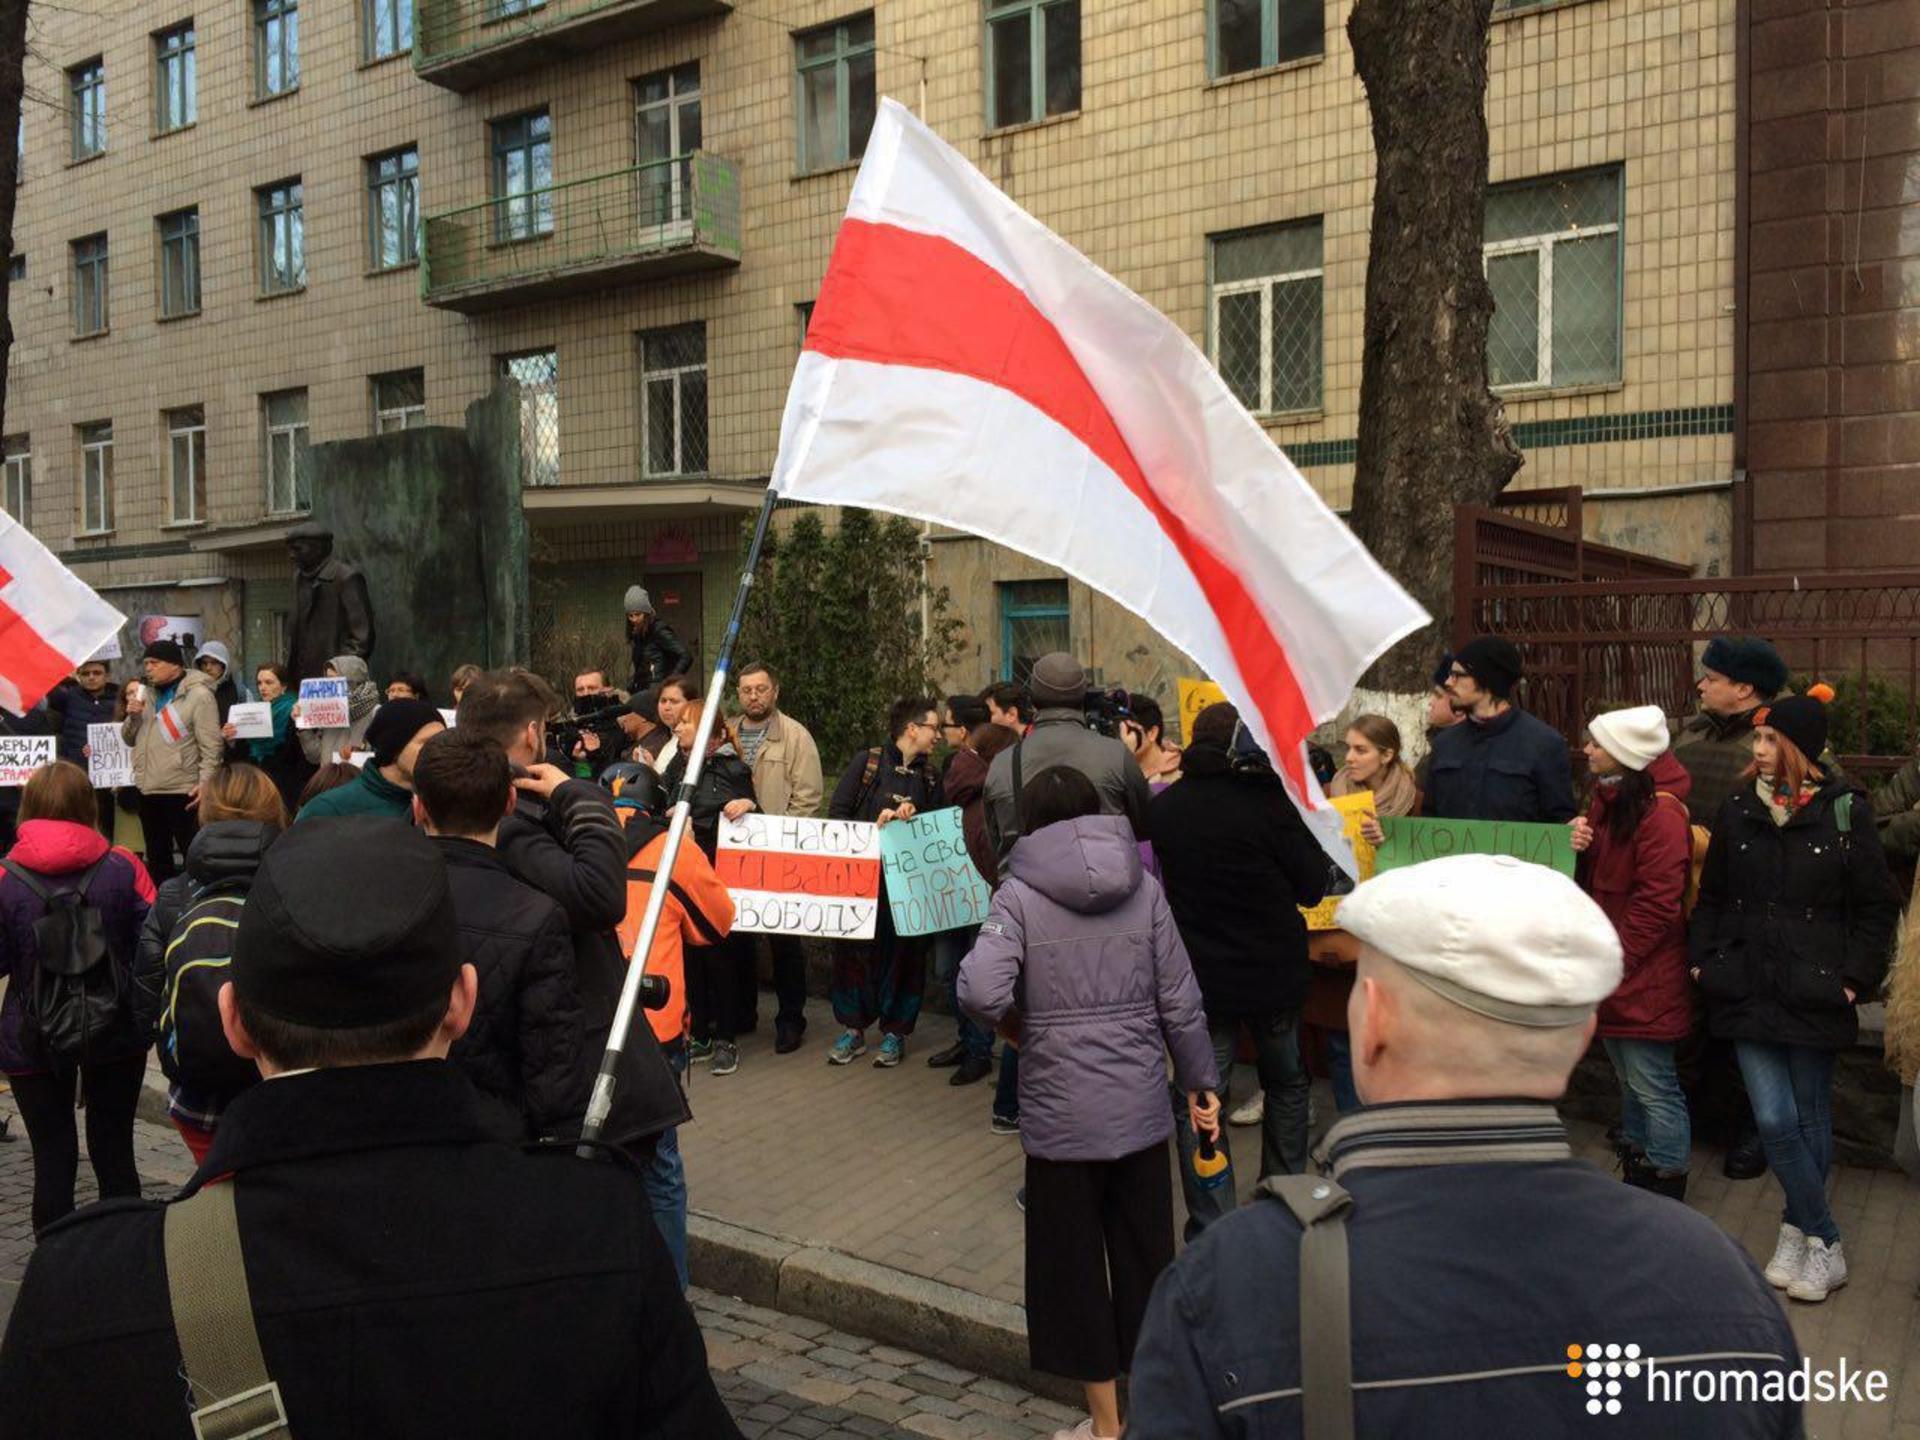 В Киеве прошла акция в поддержку протестов в Беларуси: фото